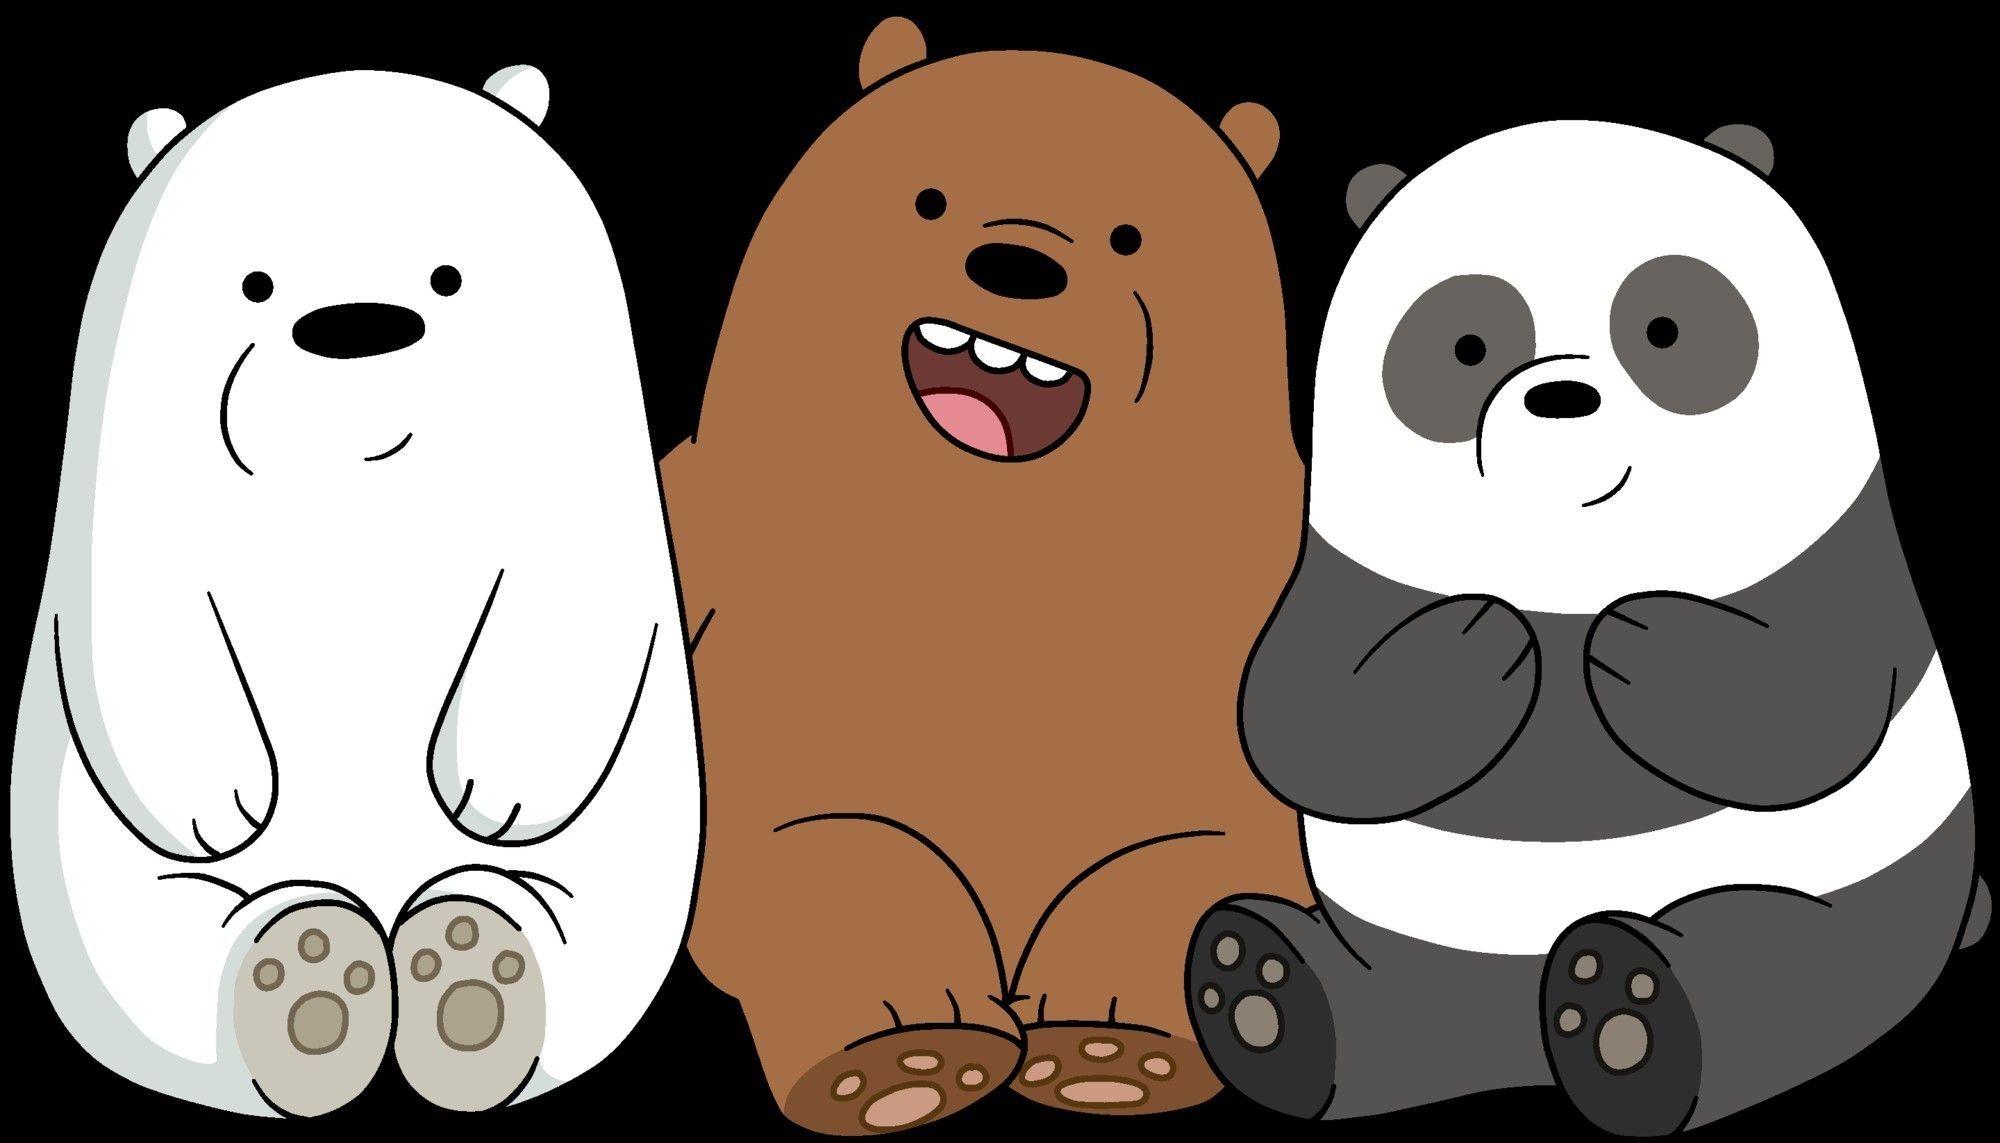 Unique We Bare Bears Wallpaper Hd Desktop In 2019 We Bare Intended For We Bare Bears Wallpaper Hd Di 2020 Gambar Hewan Lucu Boneka Hewan Beruang Kutub